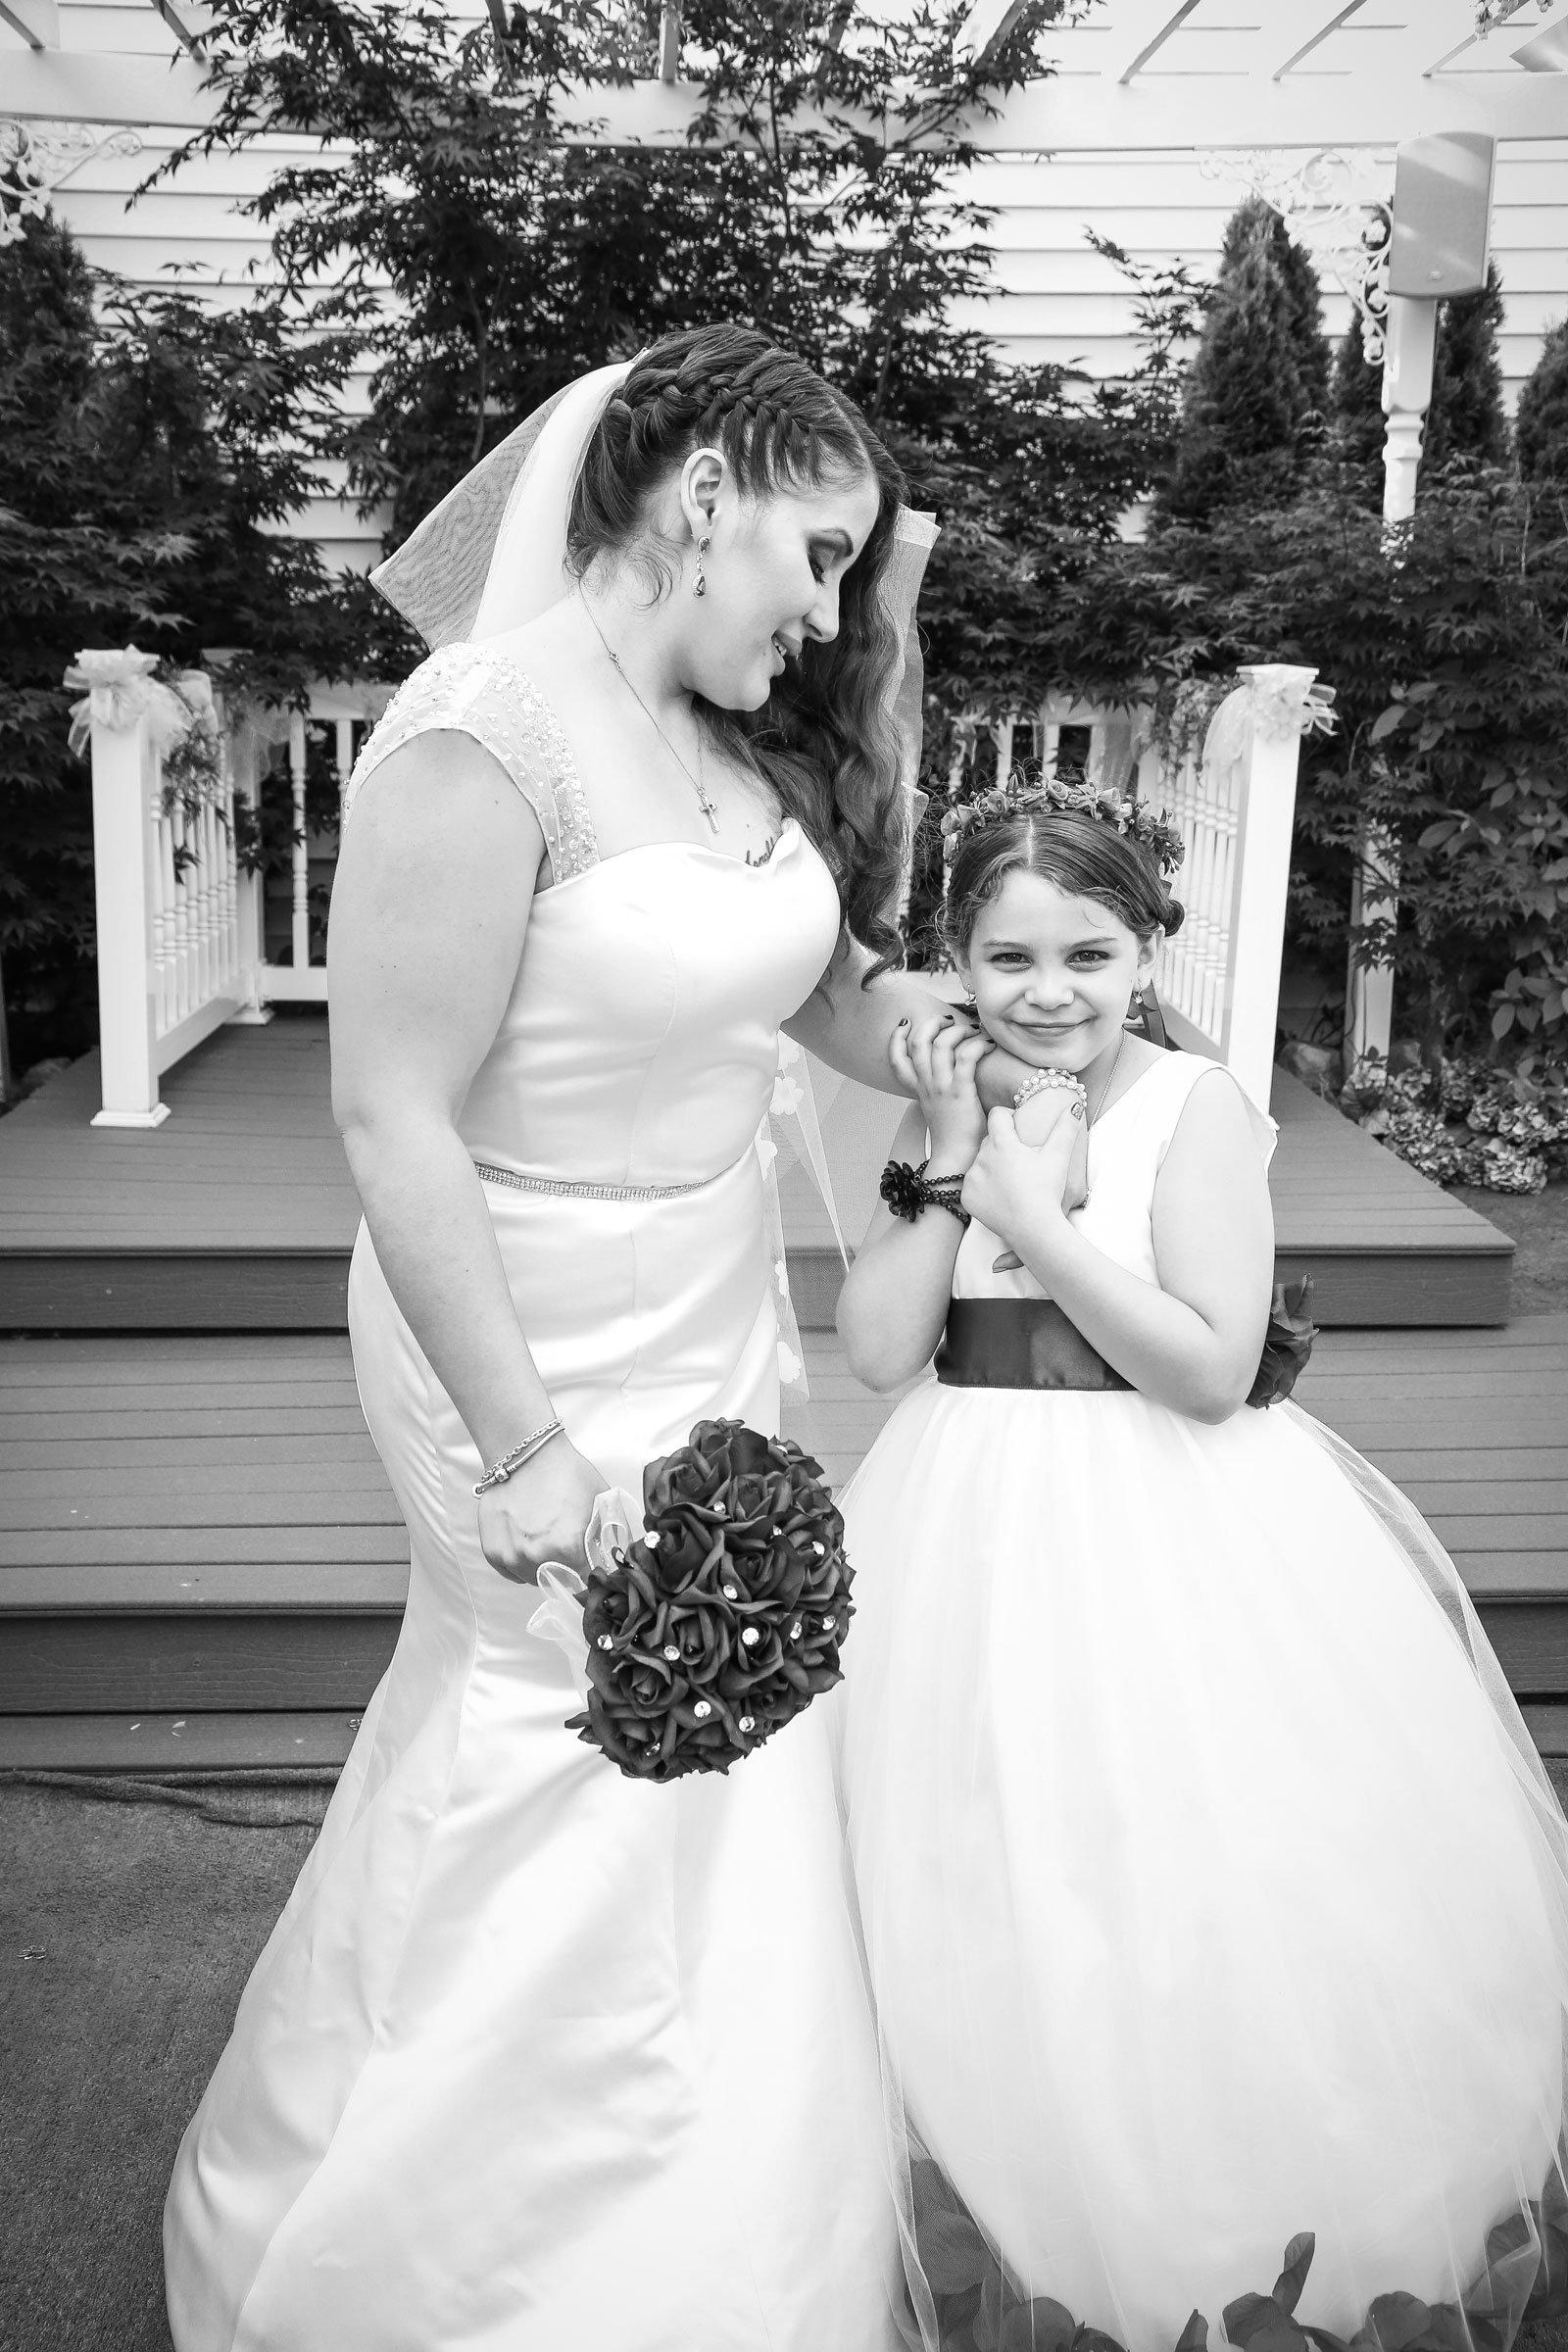 Buffalo, NY Wedding Ceremony flower girl with bride